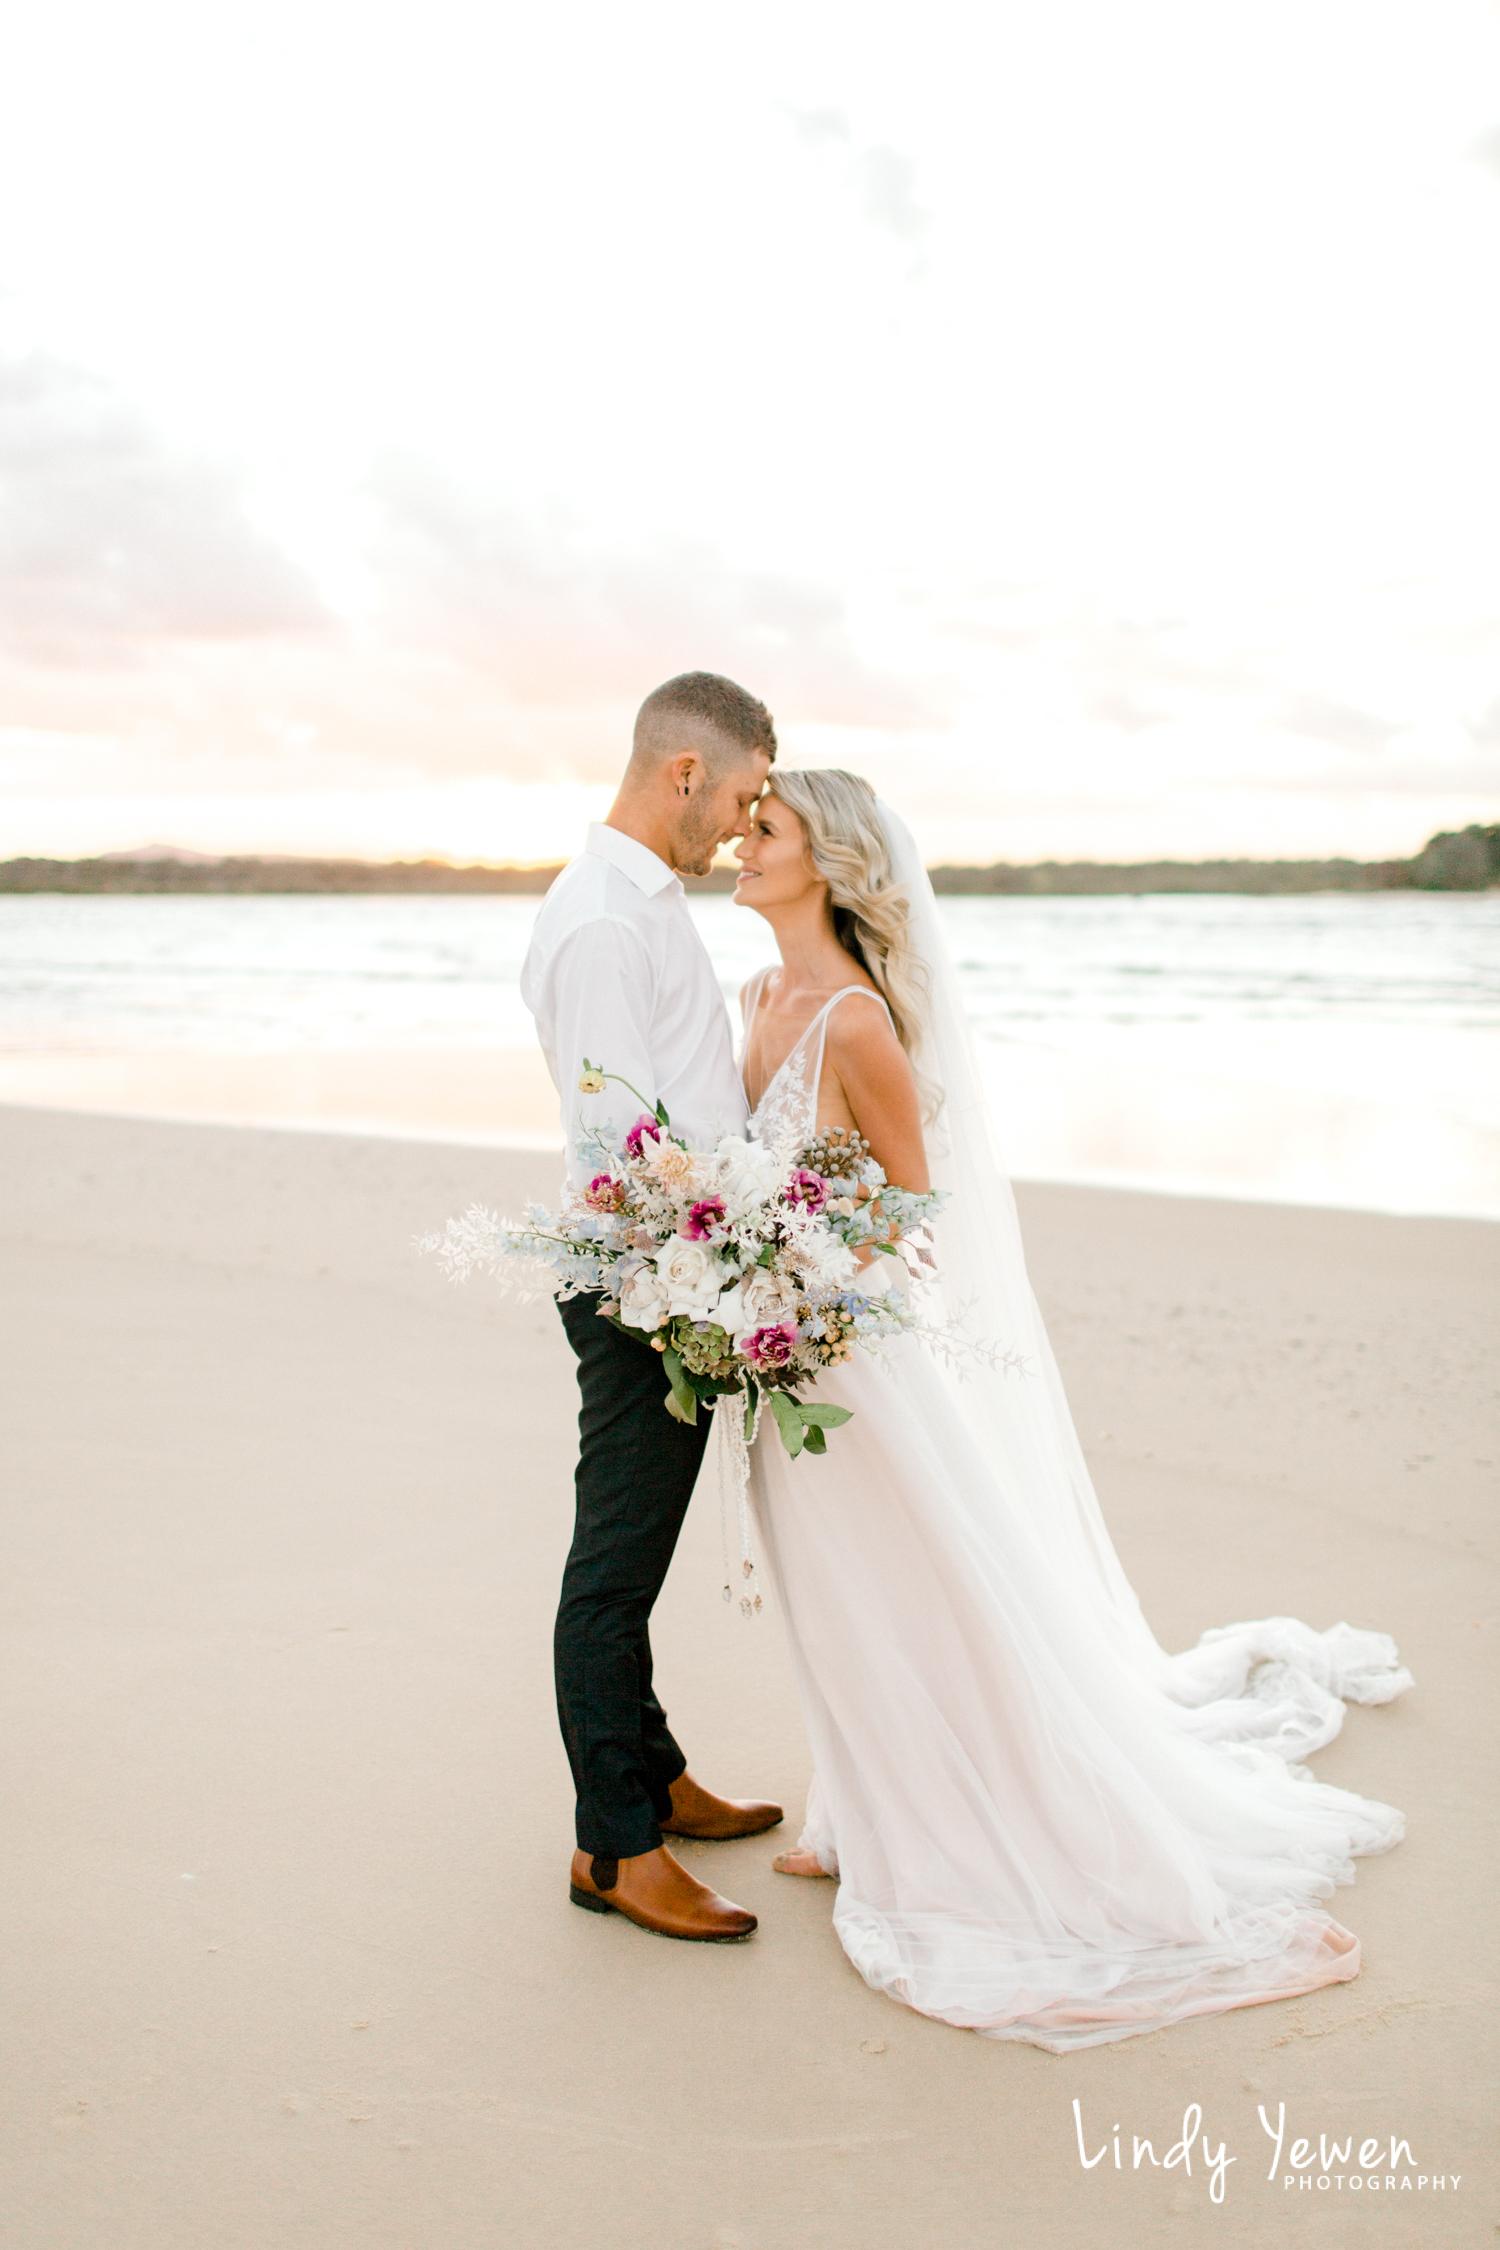 Lindy-Photography-Noosa-Weddings-Grace-Chris 285.jpg